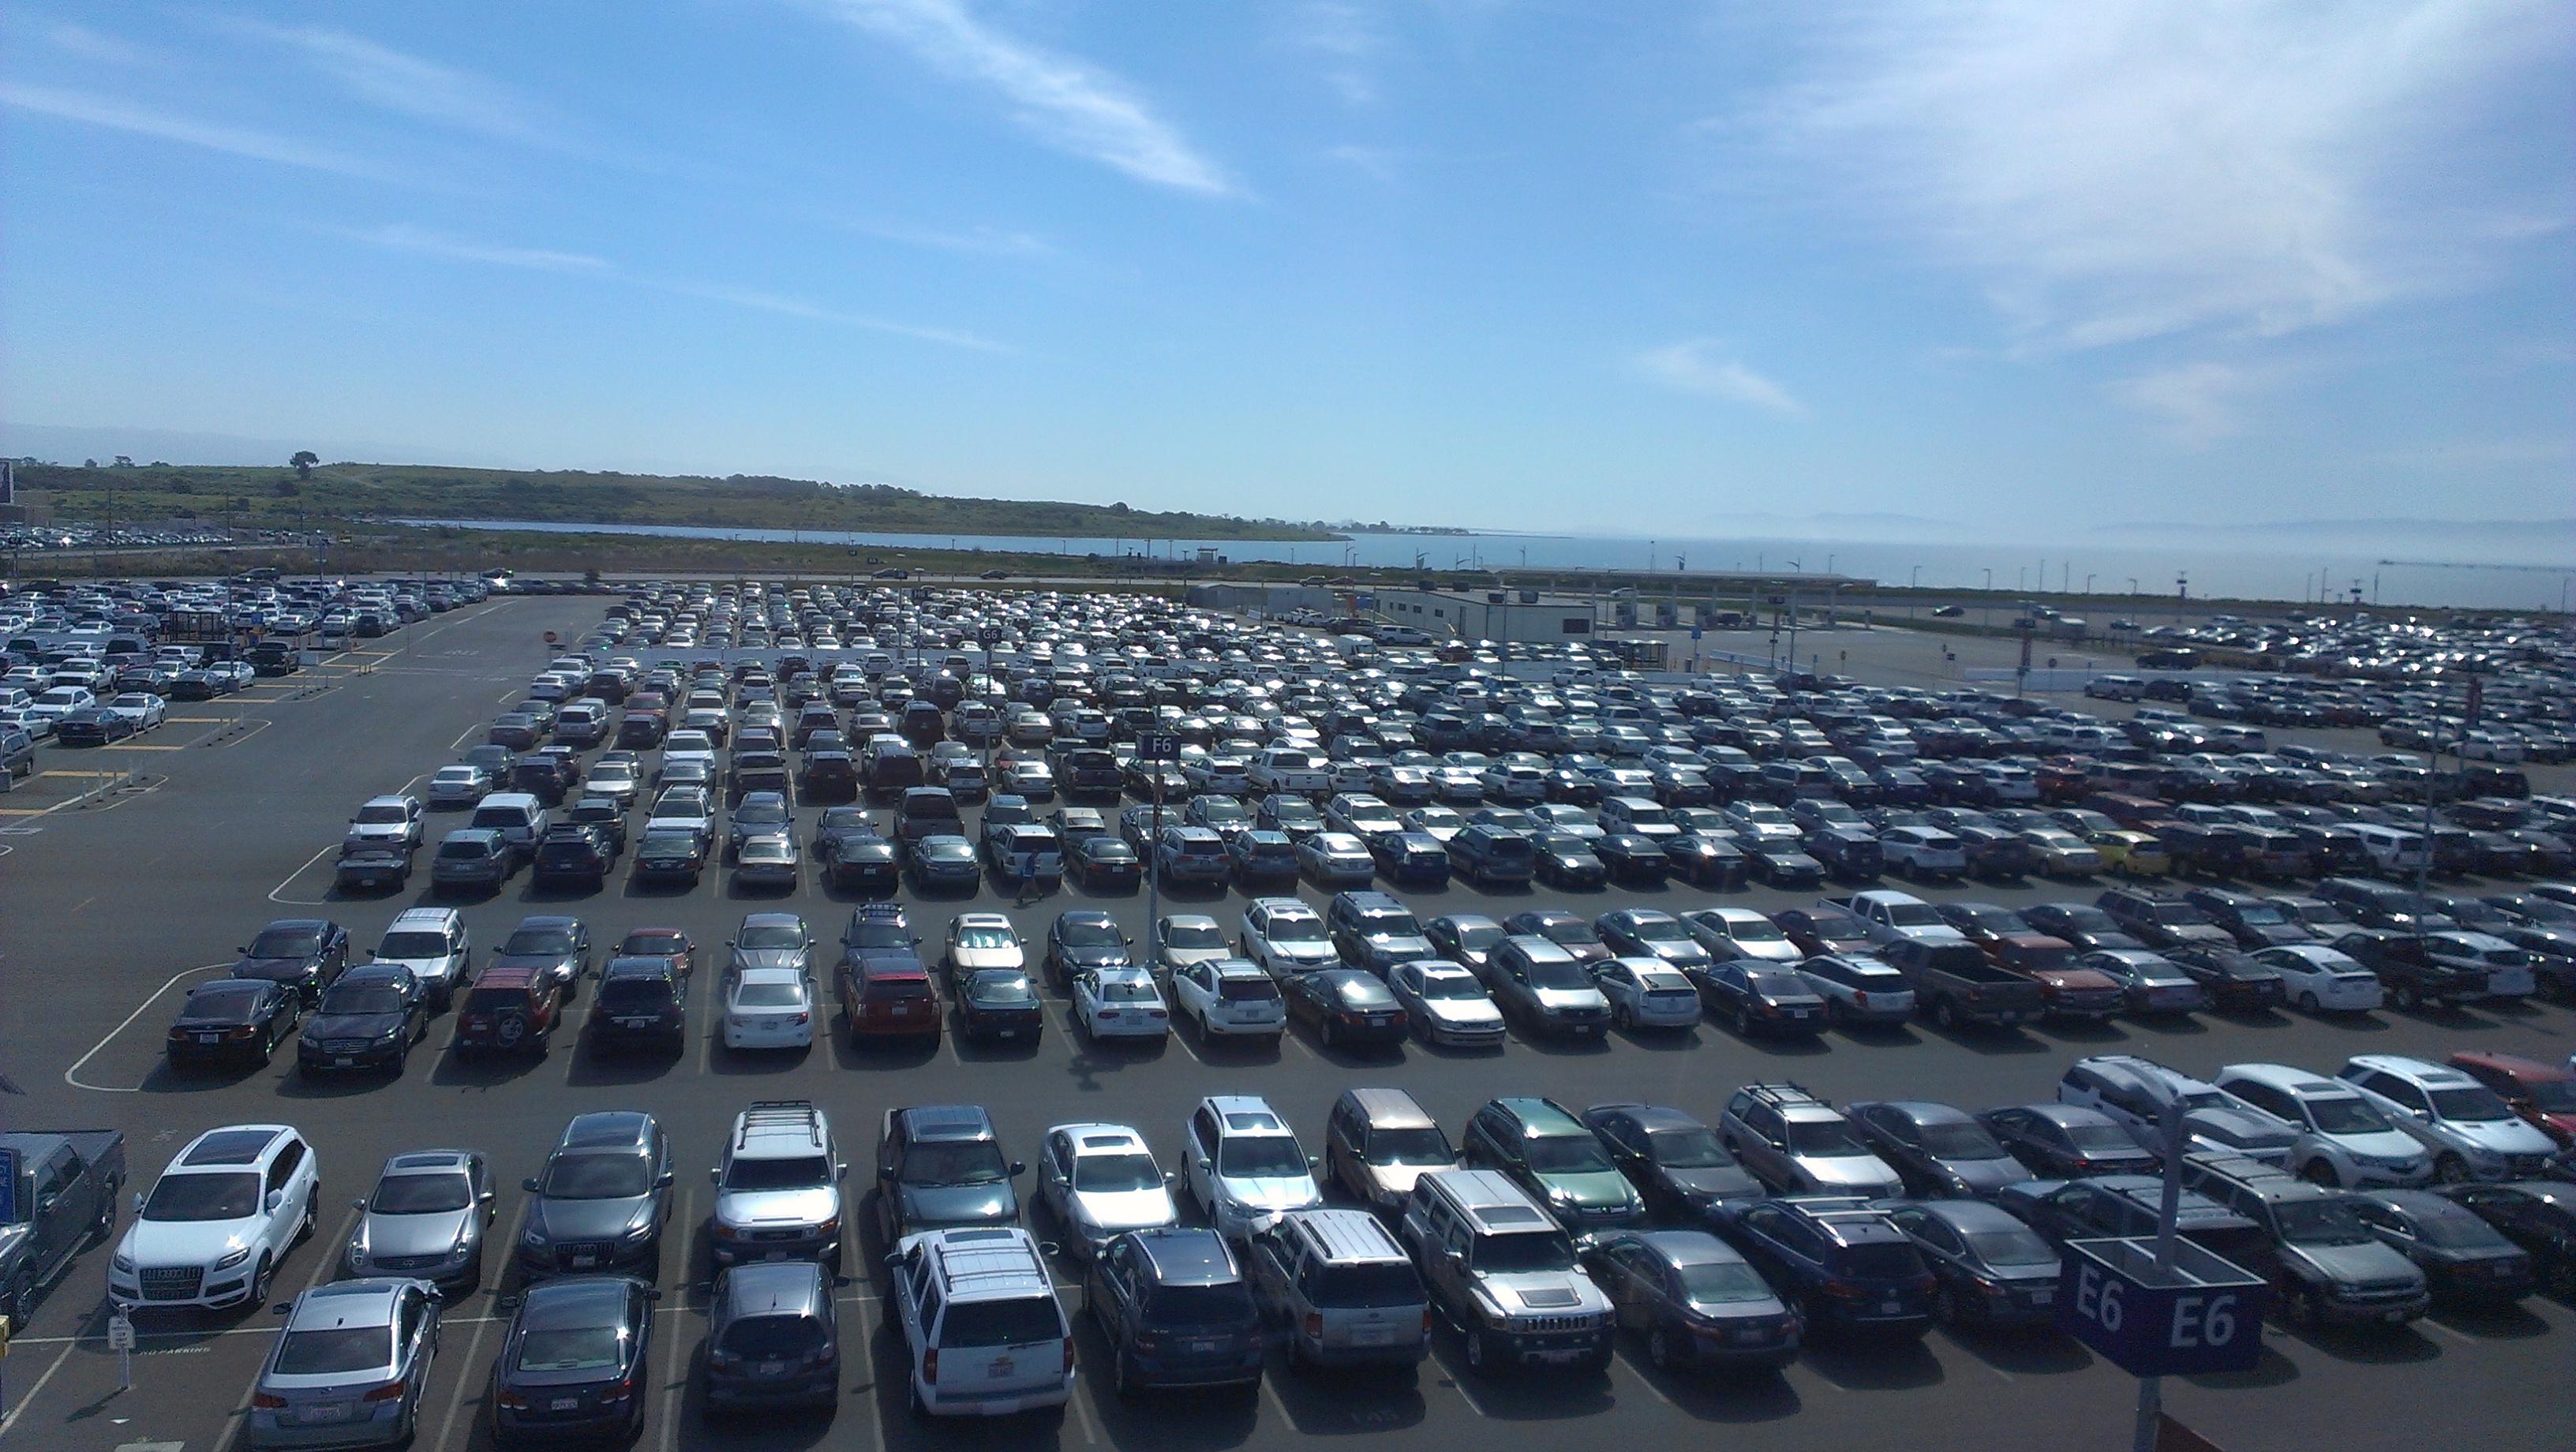 Oakland Car Rental: So Long Oakland Parking, Hello Oakland's Newest Apartments